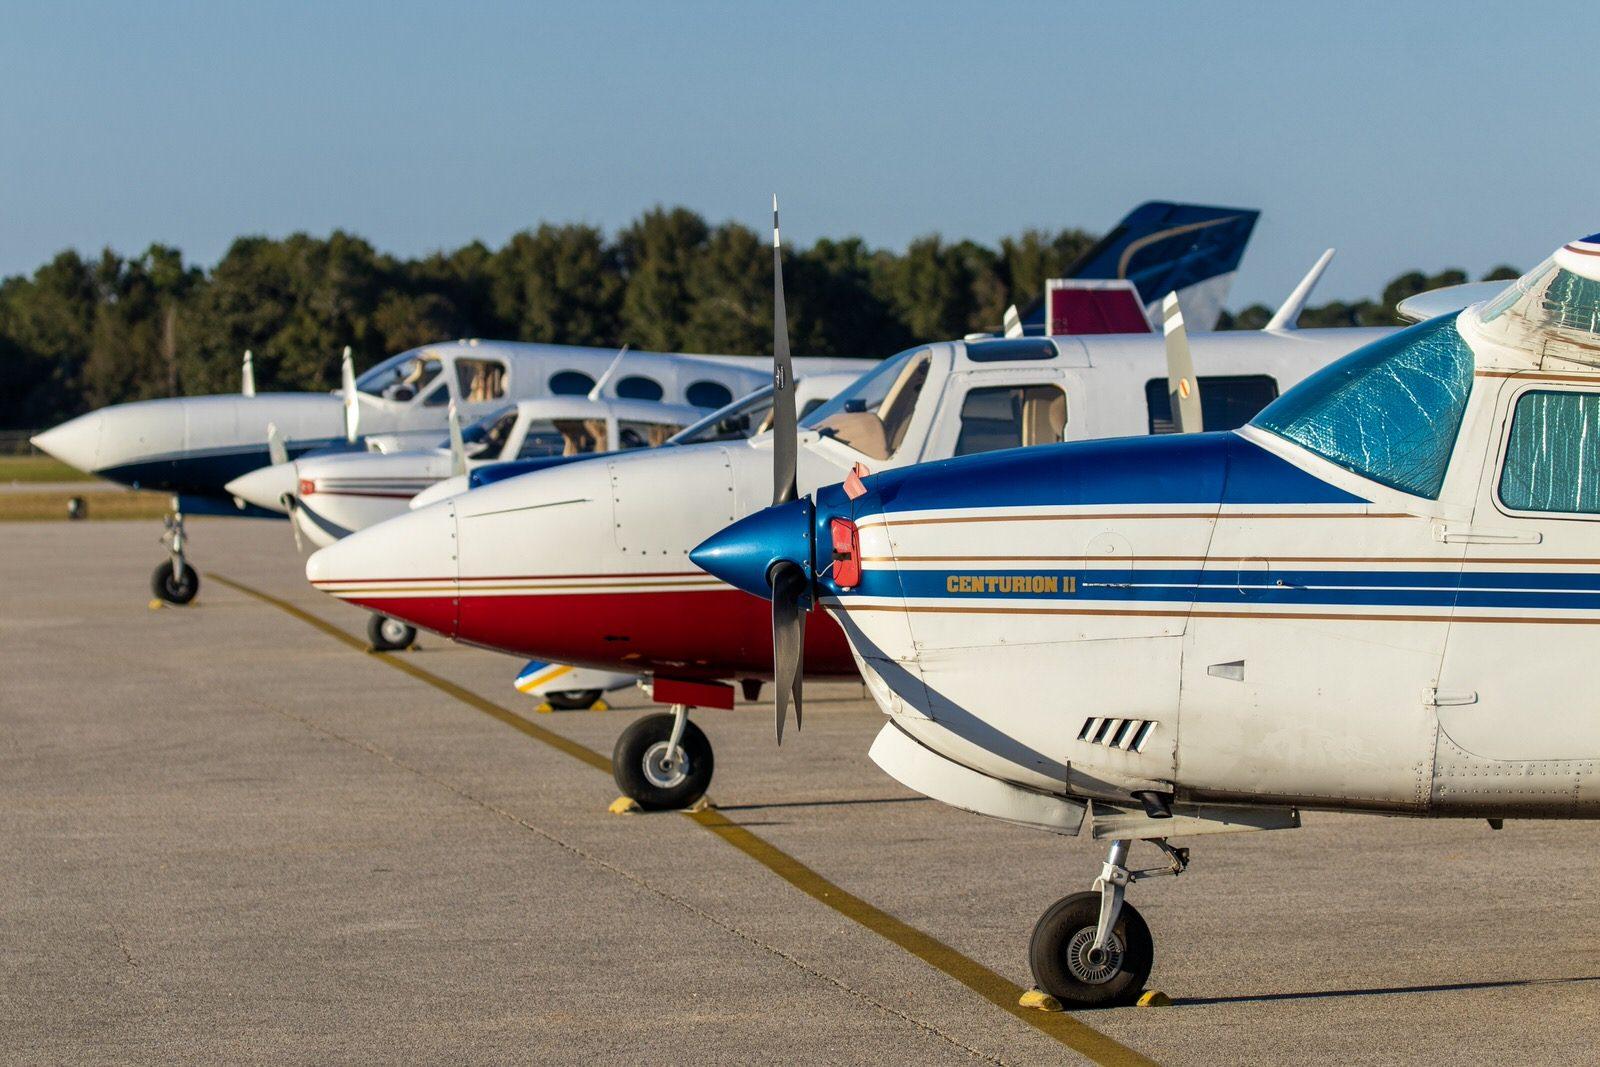 Aircraft on JKA flight line